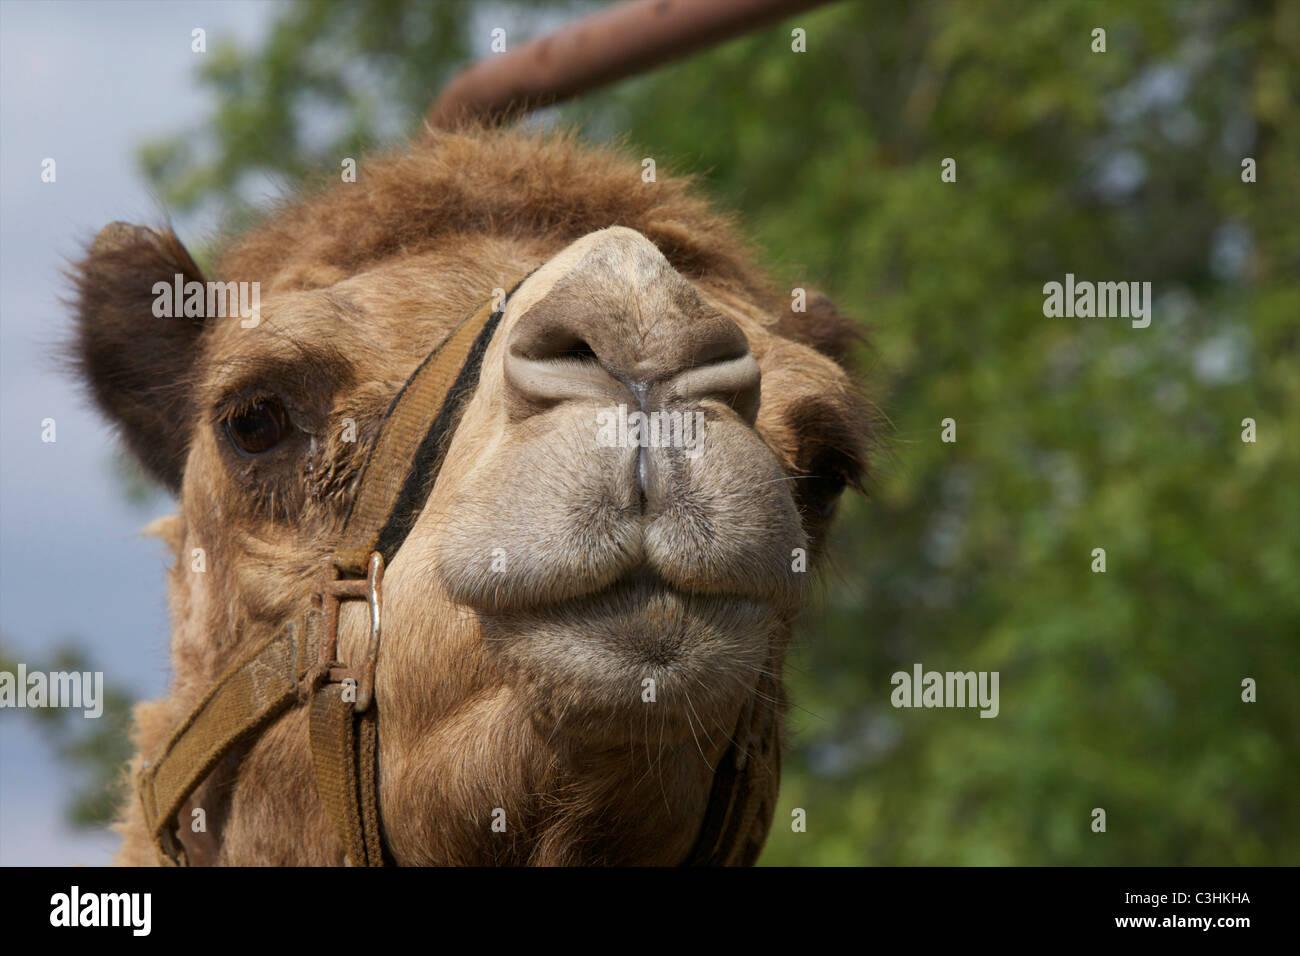 Upper Nose Stockfotos & Upper Nose Bilder - Seite 3 - Alamy